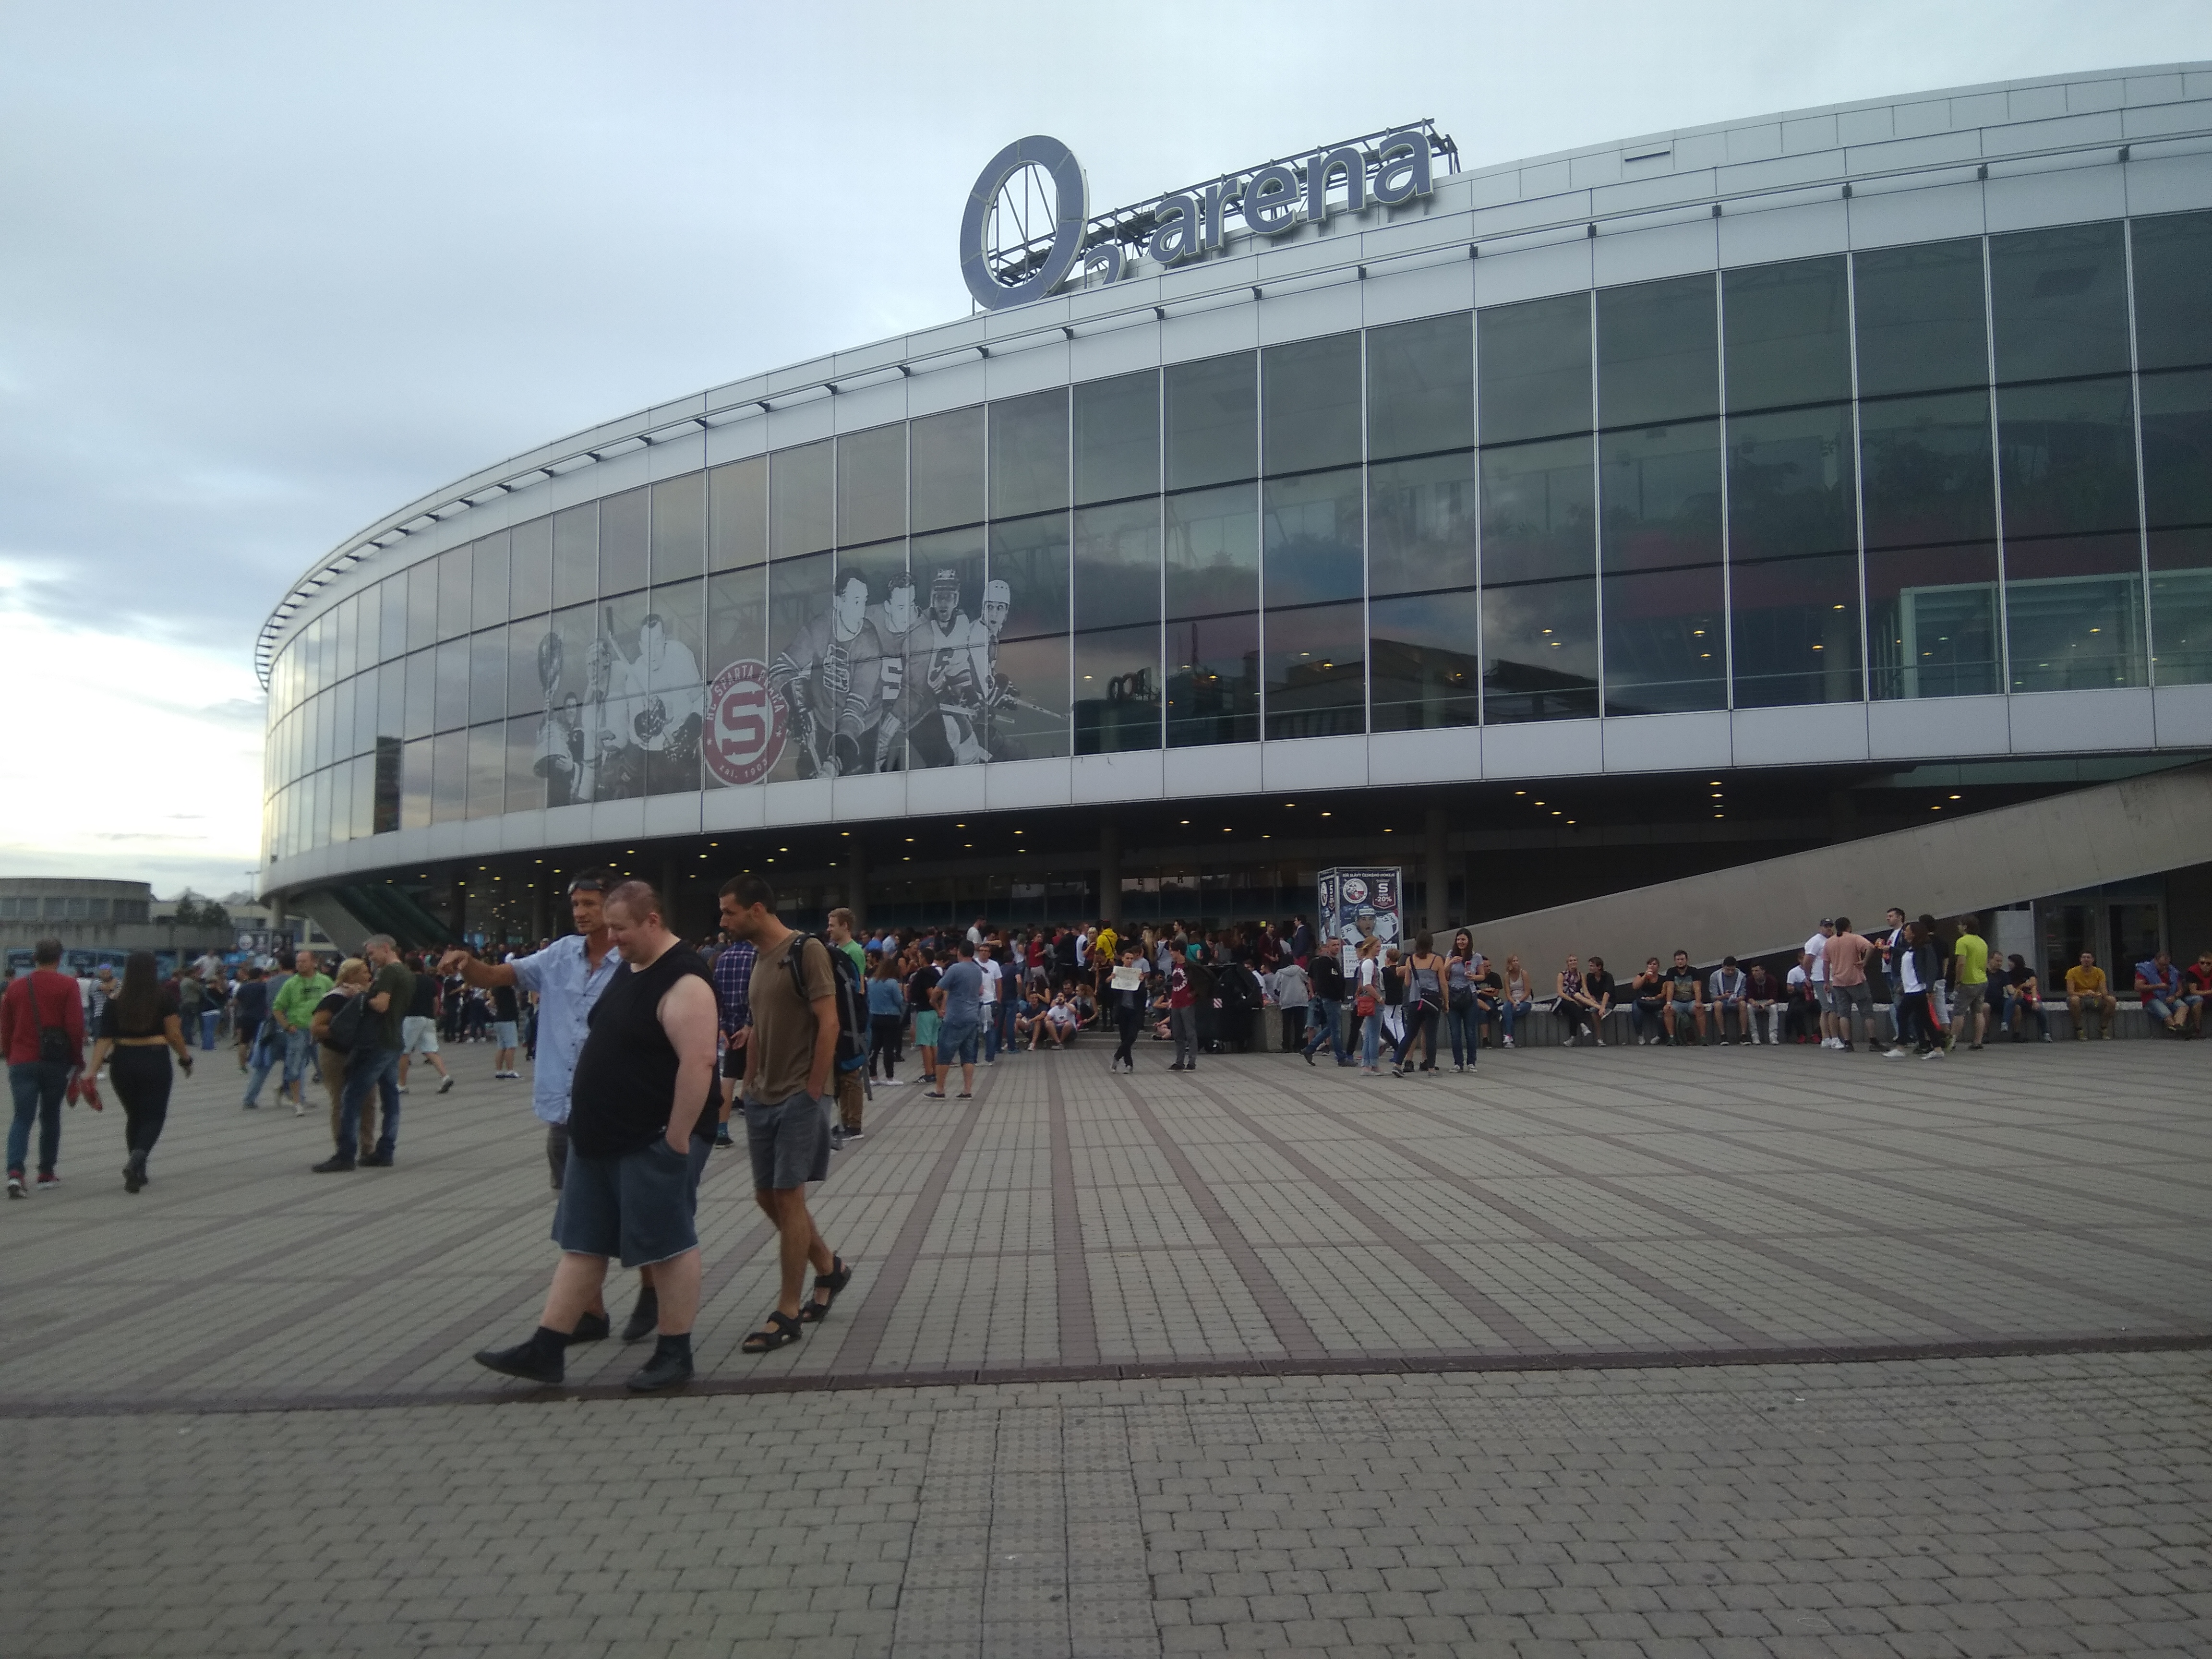 Naše fotky koncertu Red Hotov v Prahe!